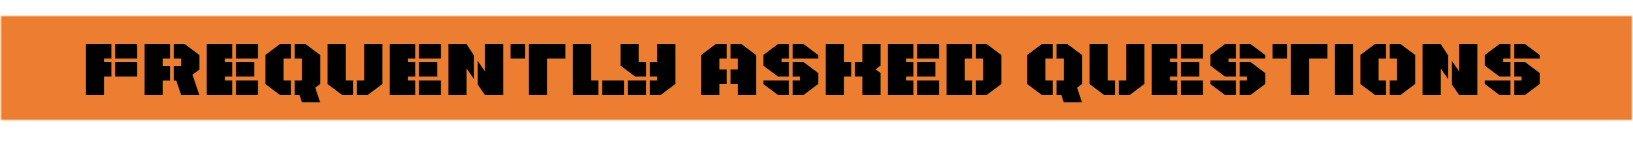 Best bike rack, vertical bike rack, altaracks , best bike rack for vans, best bike racks for sprinters, best bike rack for van life, best bike racks for families, best bike racks for kids bikes, lightest bike rack, bike rack and storage, ski rack, bike rack conversion, door access with bike rack on, recon racks, velocirax reviews, thule, Yakima, hangover assembly, bike rack reviews, vertical bike rack vs horizontal, platform bike racks, bike rack damage, safest bike rack, north shore racks, saris, offroading bike rack, bike rack for overlanders, vanlife bike rack, hitch extender for vans, class three receiver, velocirax reviews, best bike rack for minivans, best bike rack for RVs, whats the difference between upright bike racks, vertica bike racks reviews, best vertical bike rack